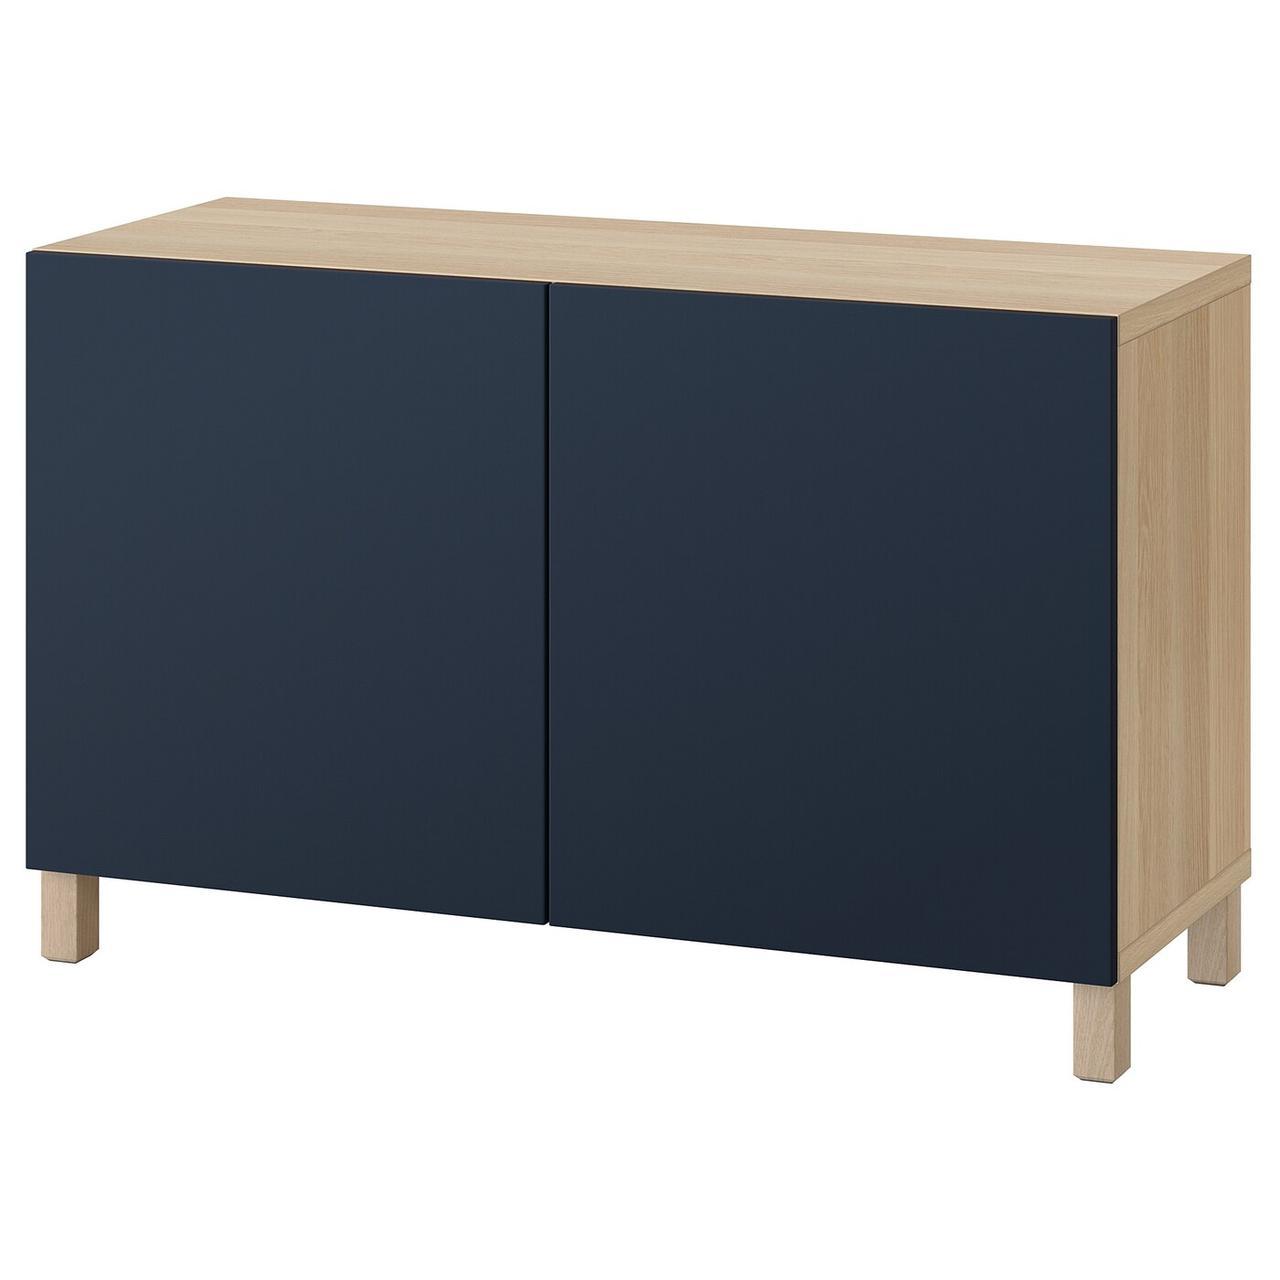 IKEA BESTÅ Комбинация с дверцами дуб bejcowany на бело/Notviken/Stubbarp синий 120x42x74 см